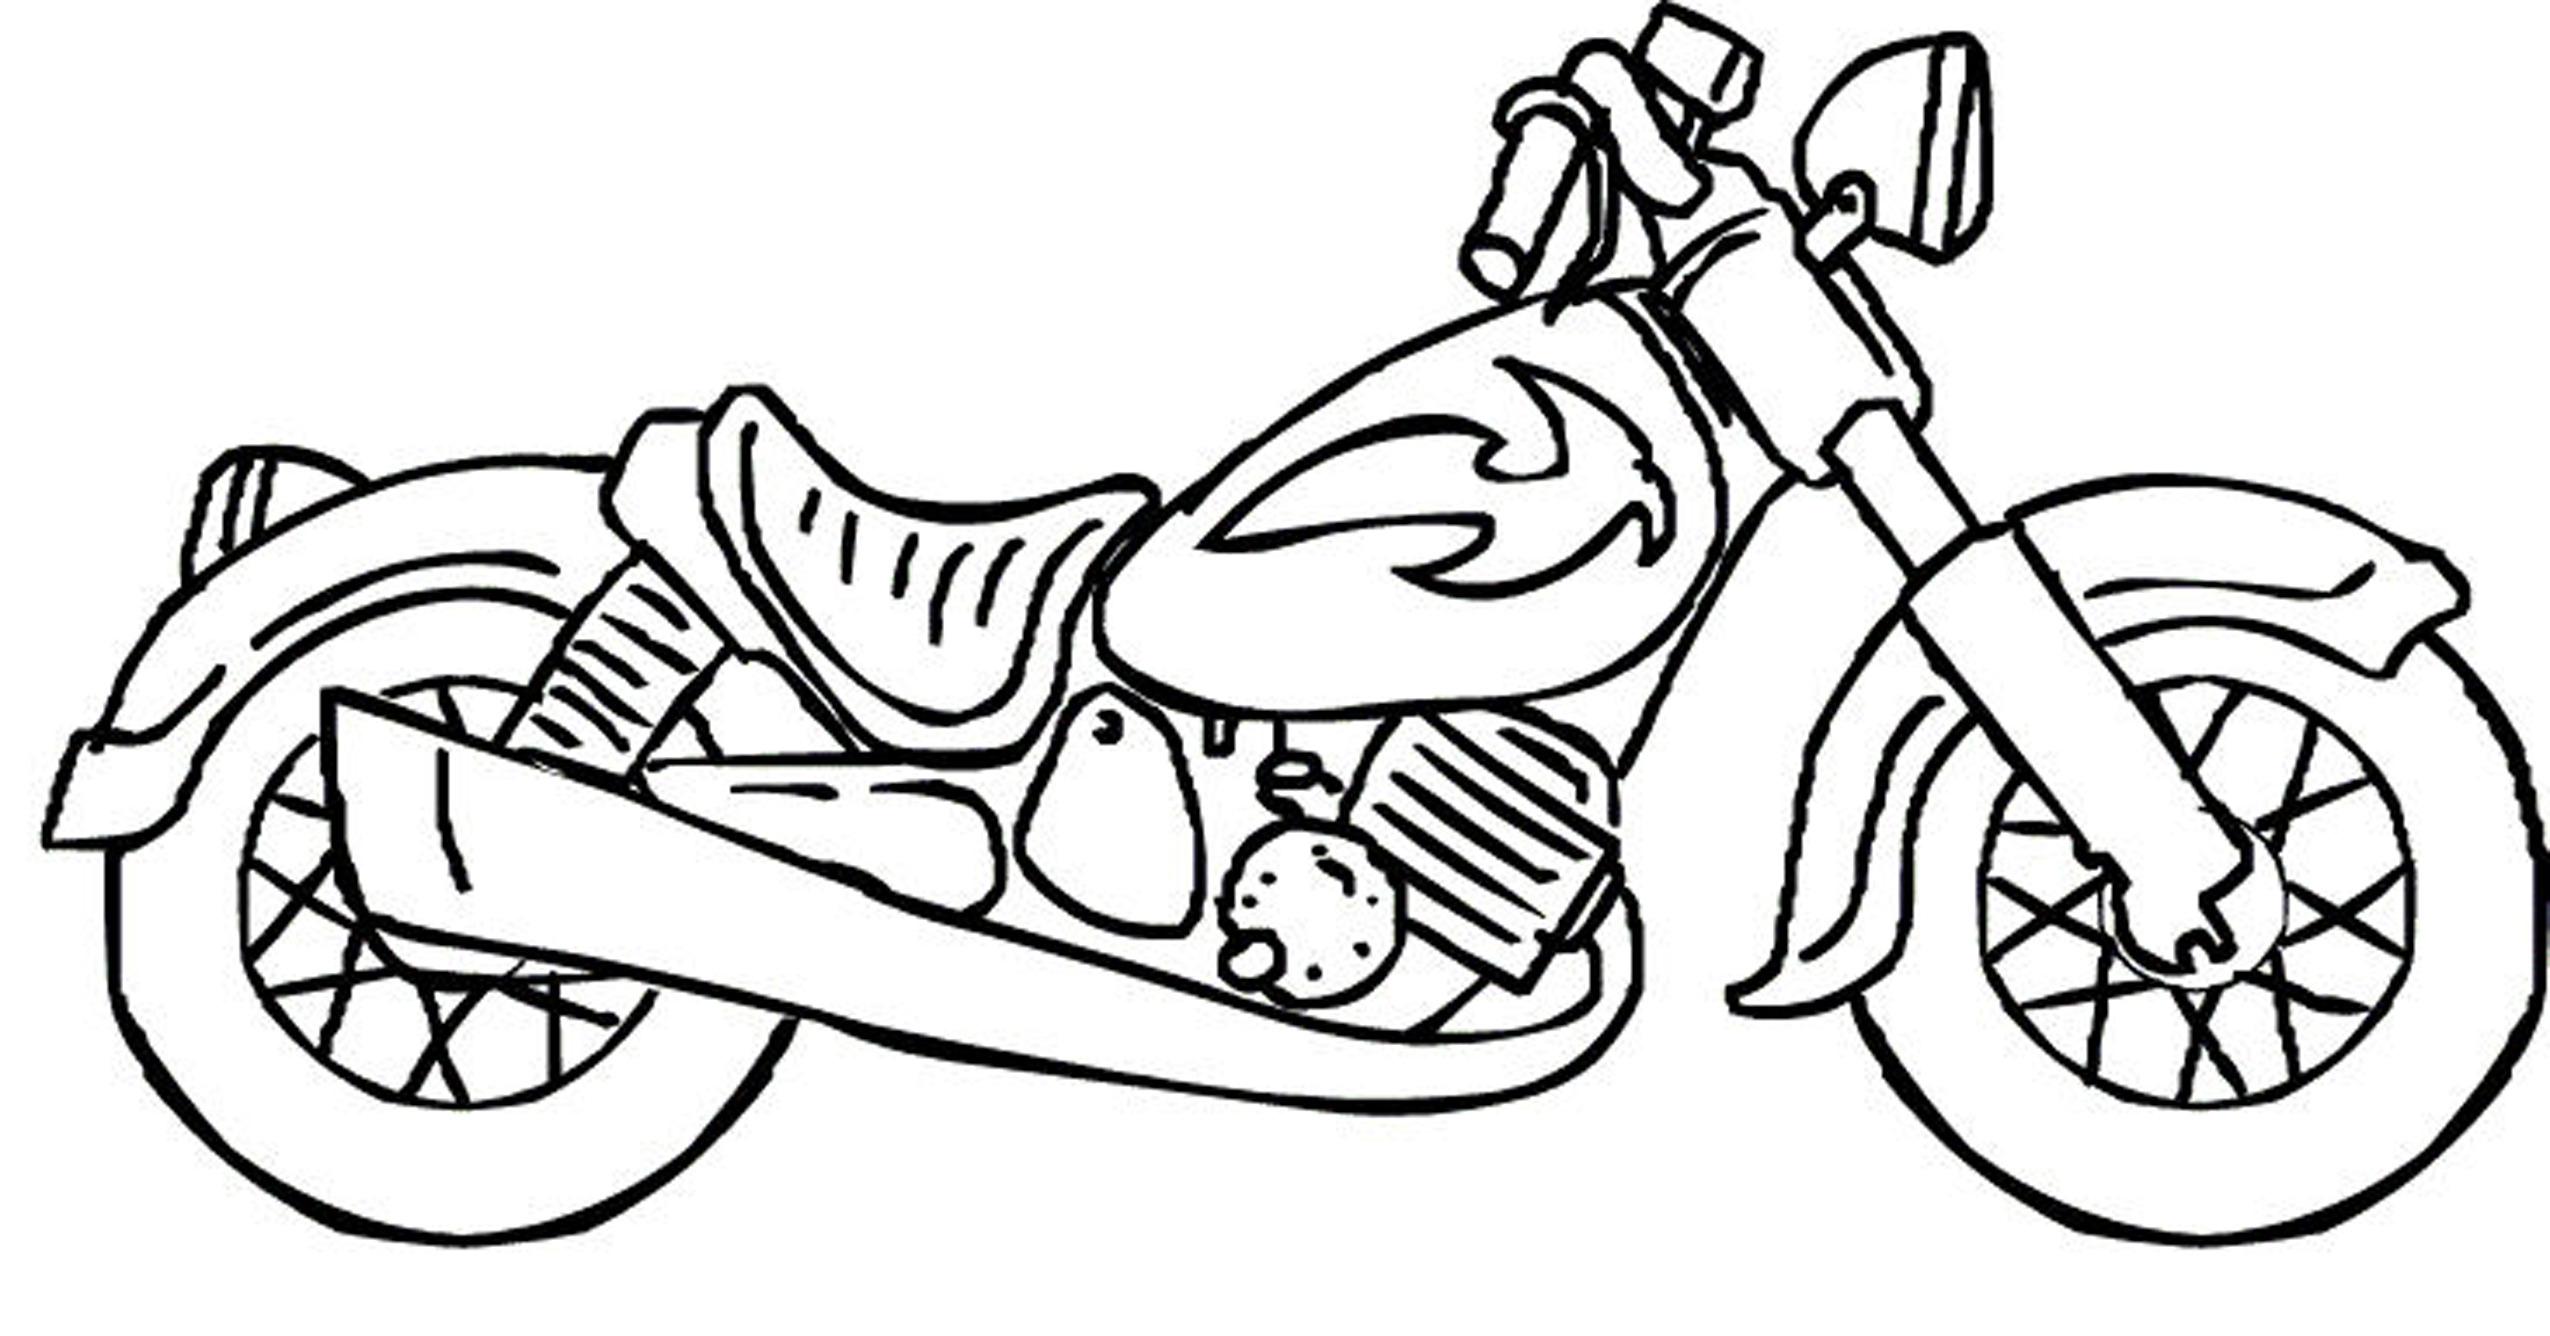 2550x1336 Inspiring Motorcycle Coloring Sheets